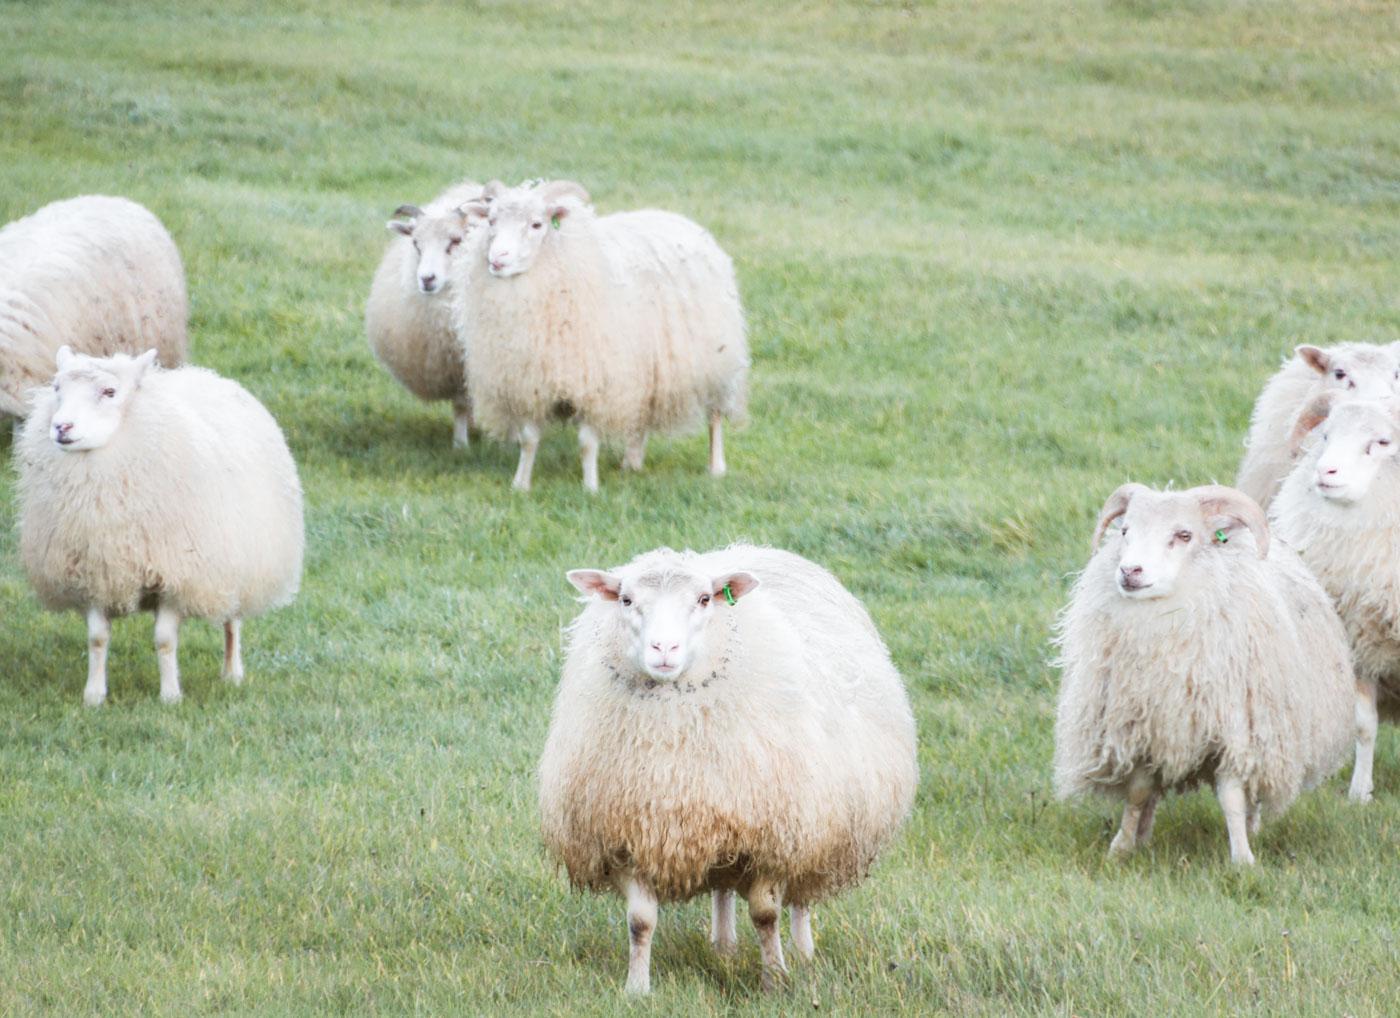 Islandia owce